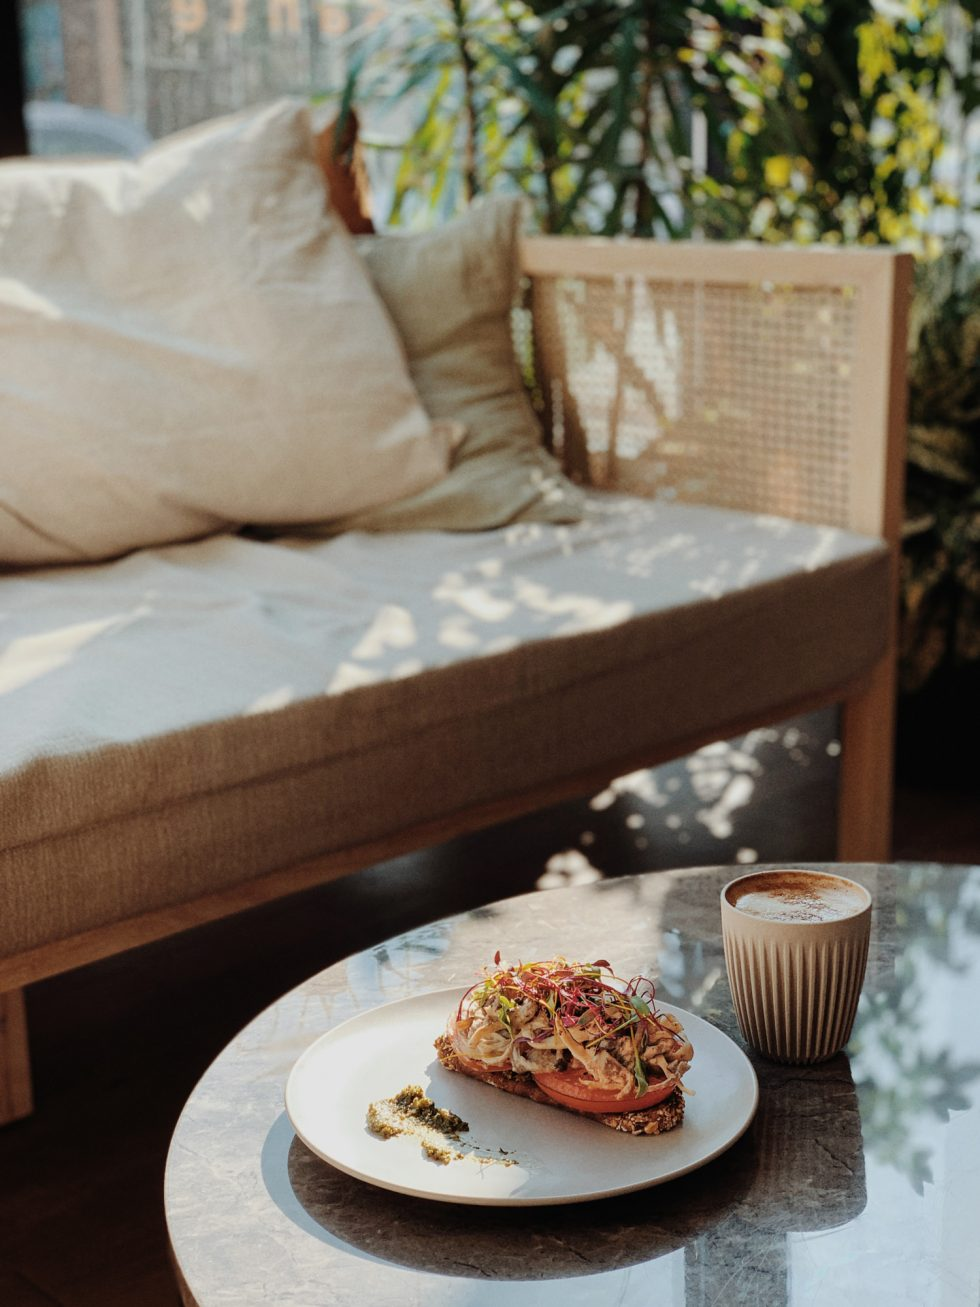 archway-bar-vegan-restaurant-food-montreal-lifestyle-photographer-laura-g-diaz